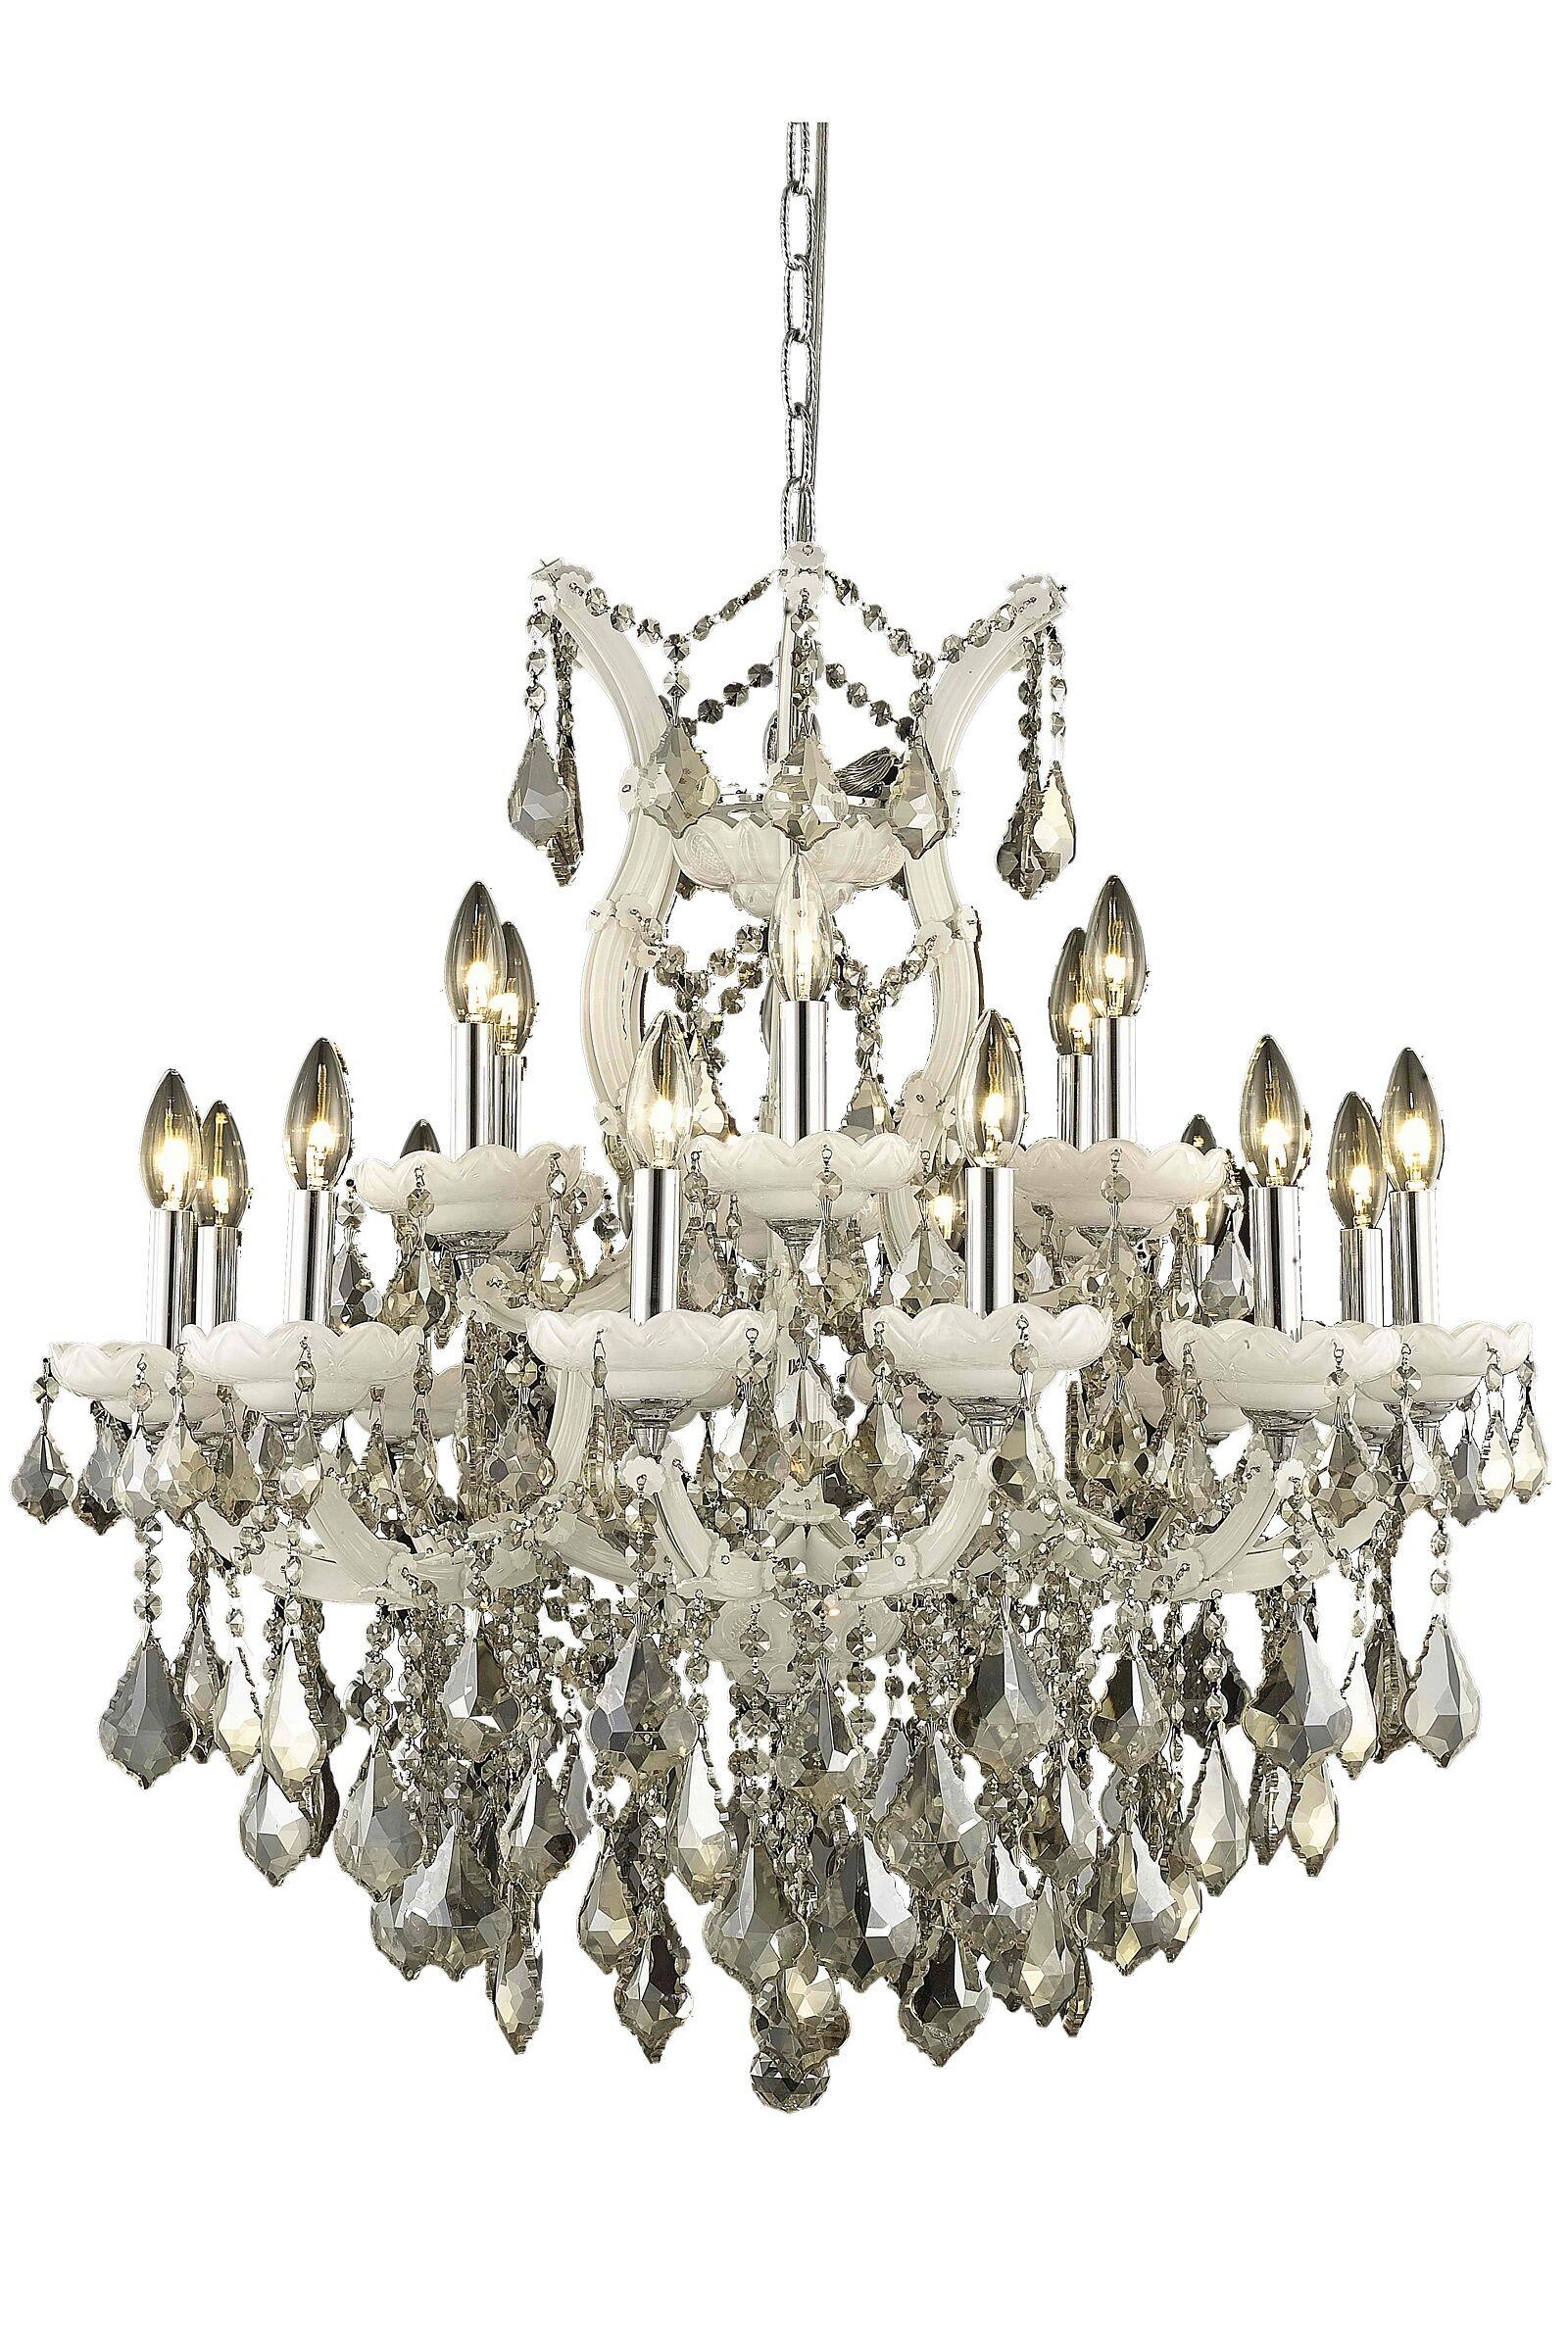 Regina 19-Light Chandelier Finish / Crystal Finish / Crystal Trim: White / Golden Teak (Smoky) / Royal Cut